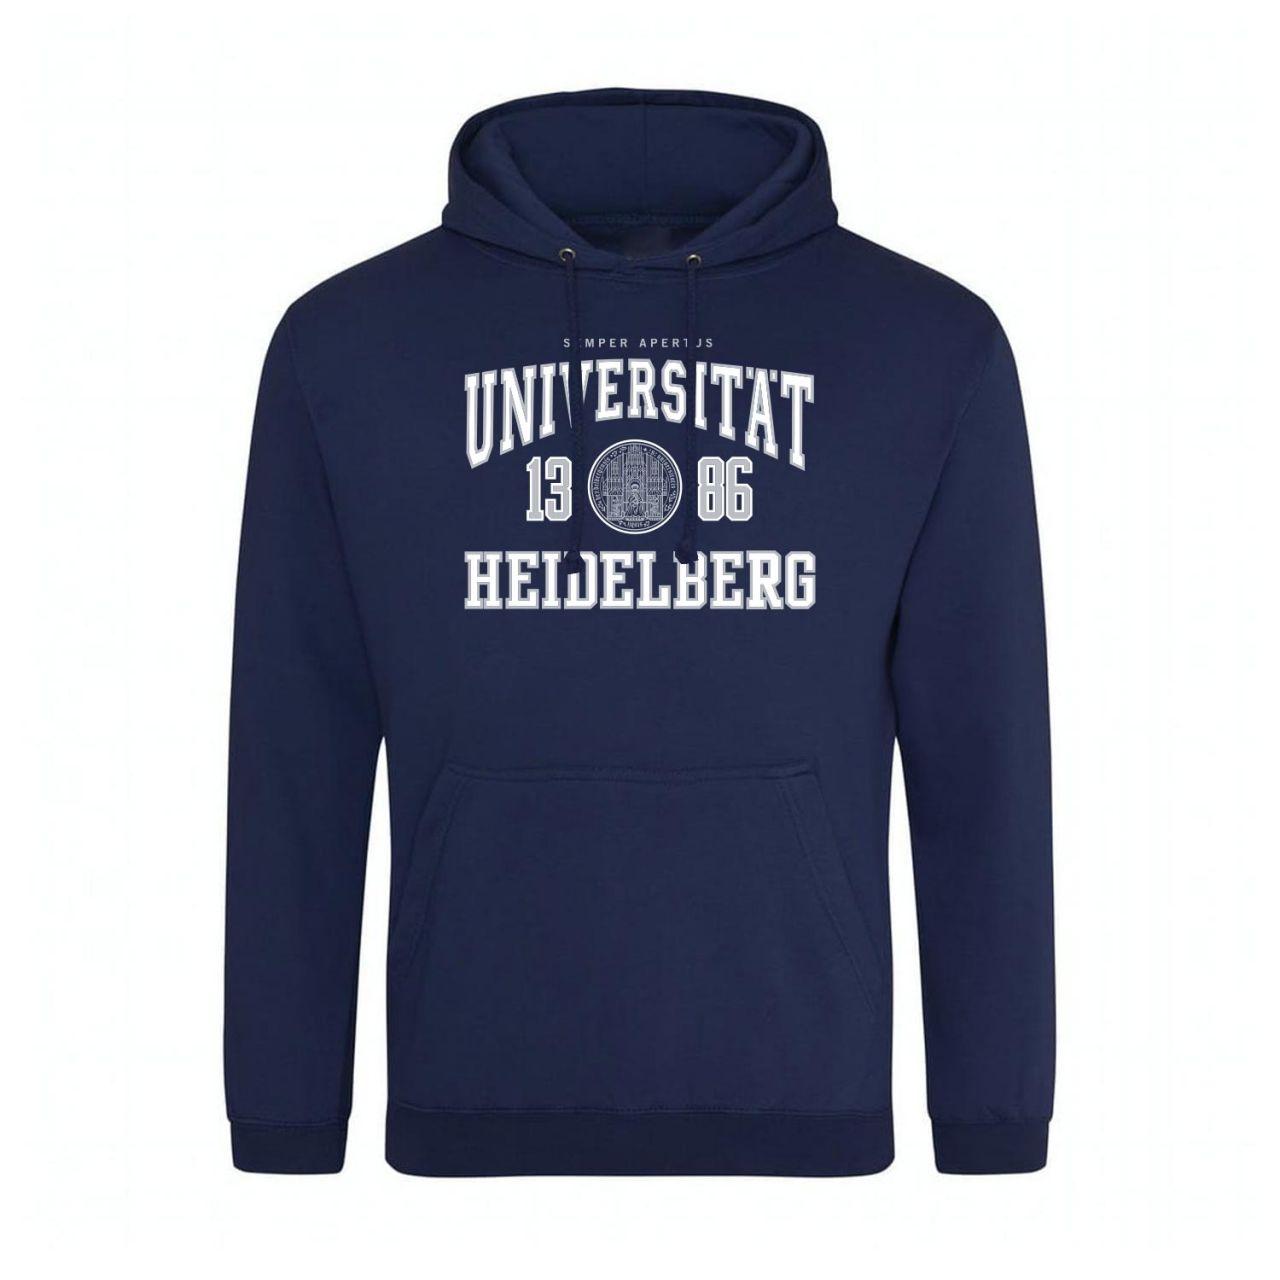 Classic Hooded Sweatshirt, navy, classic